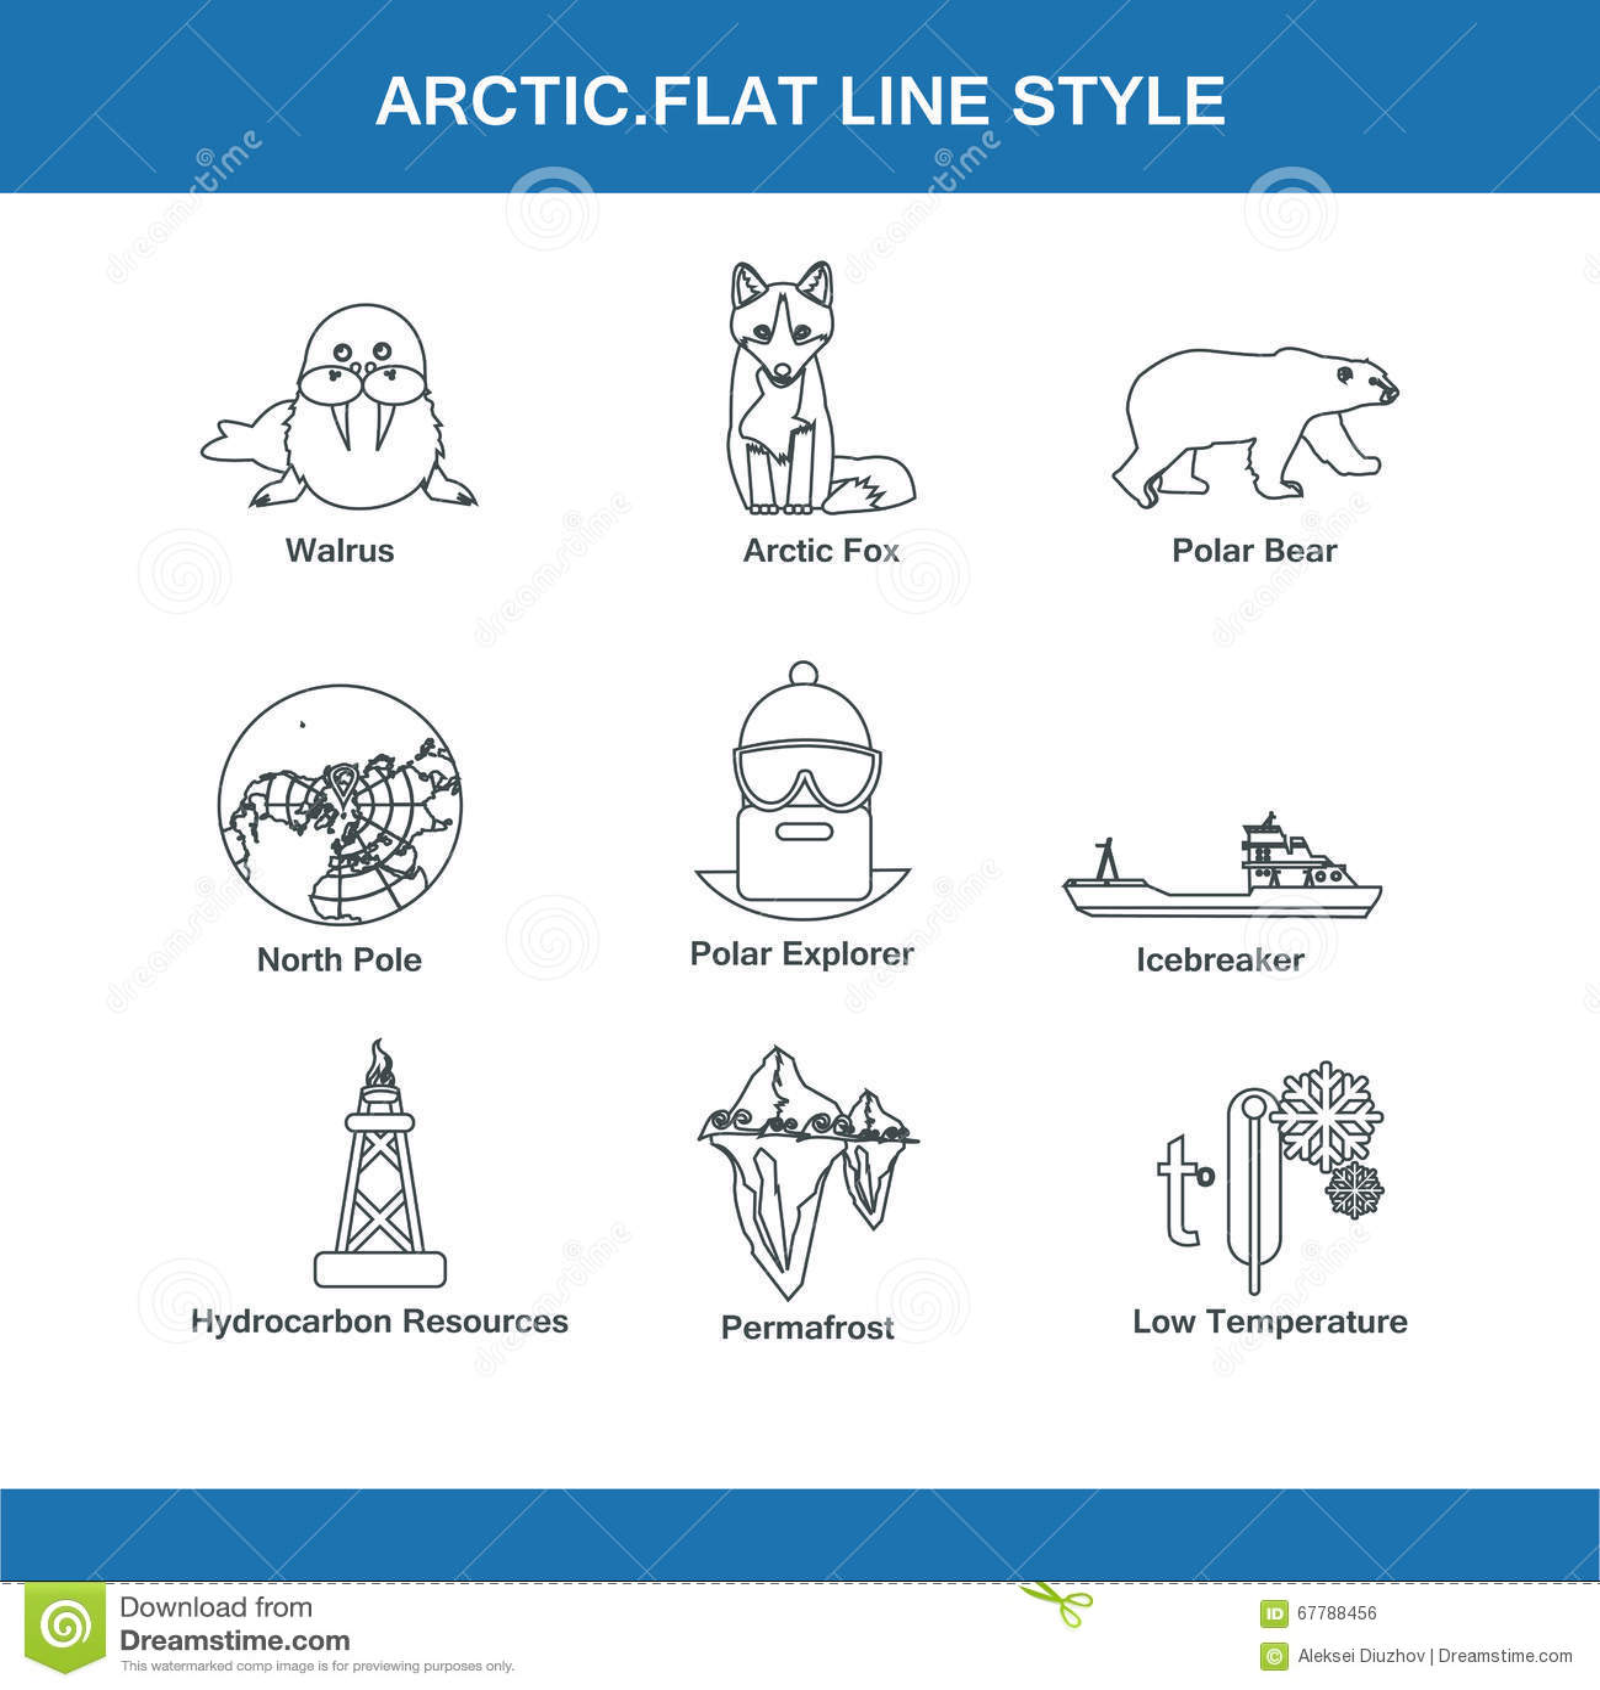 Arctic Line : Arctic flat line style stock illustration image